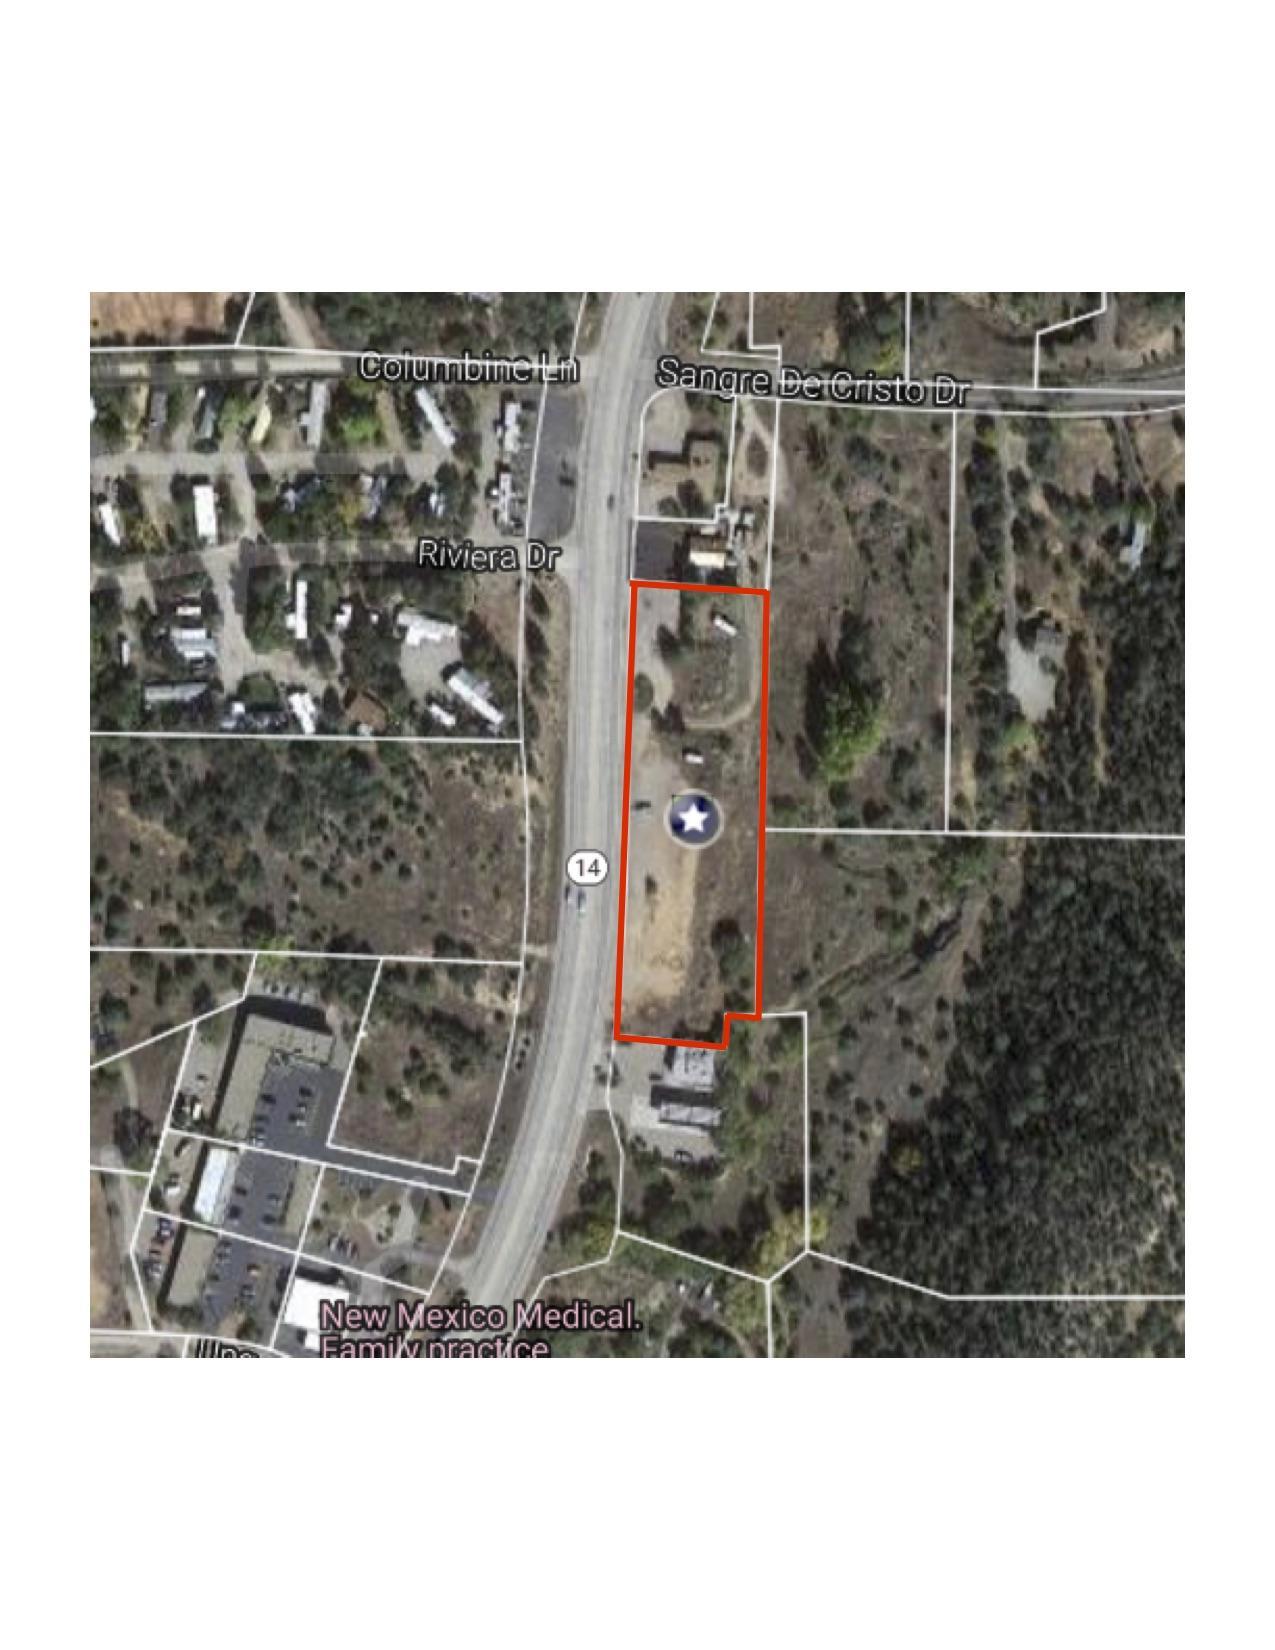 12138 N Highway 14, Cedar Crest, NM 87008 - Cedar Crest, NM real estate listing